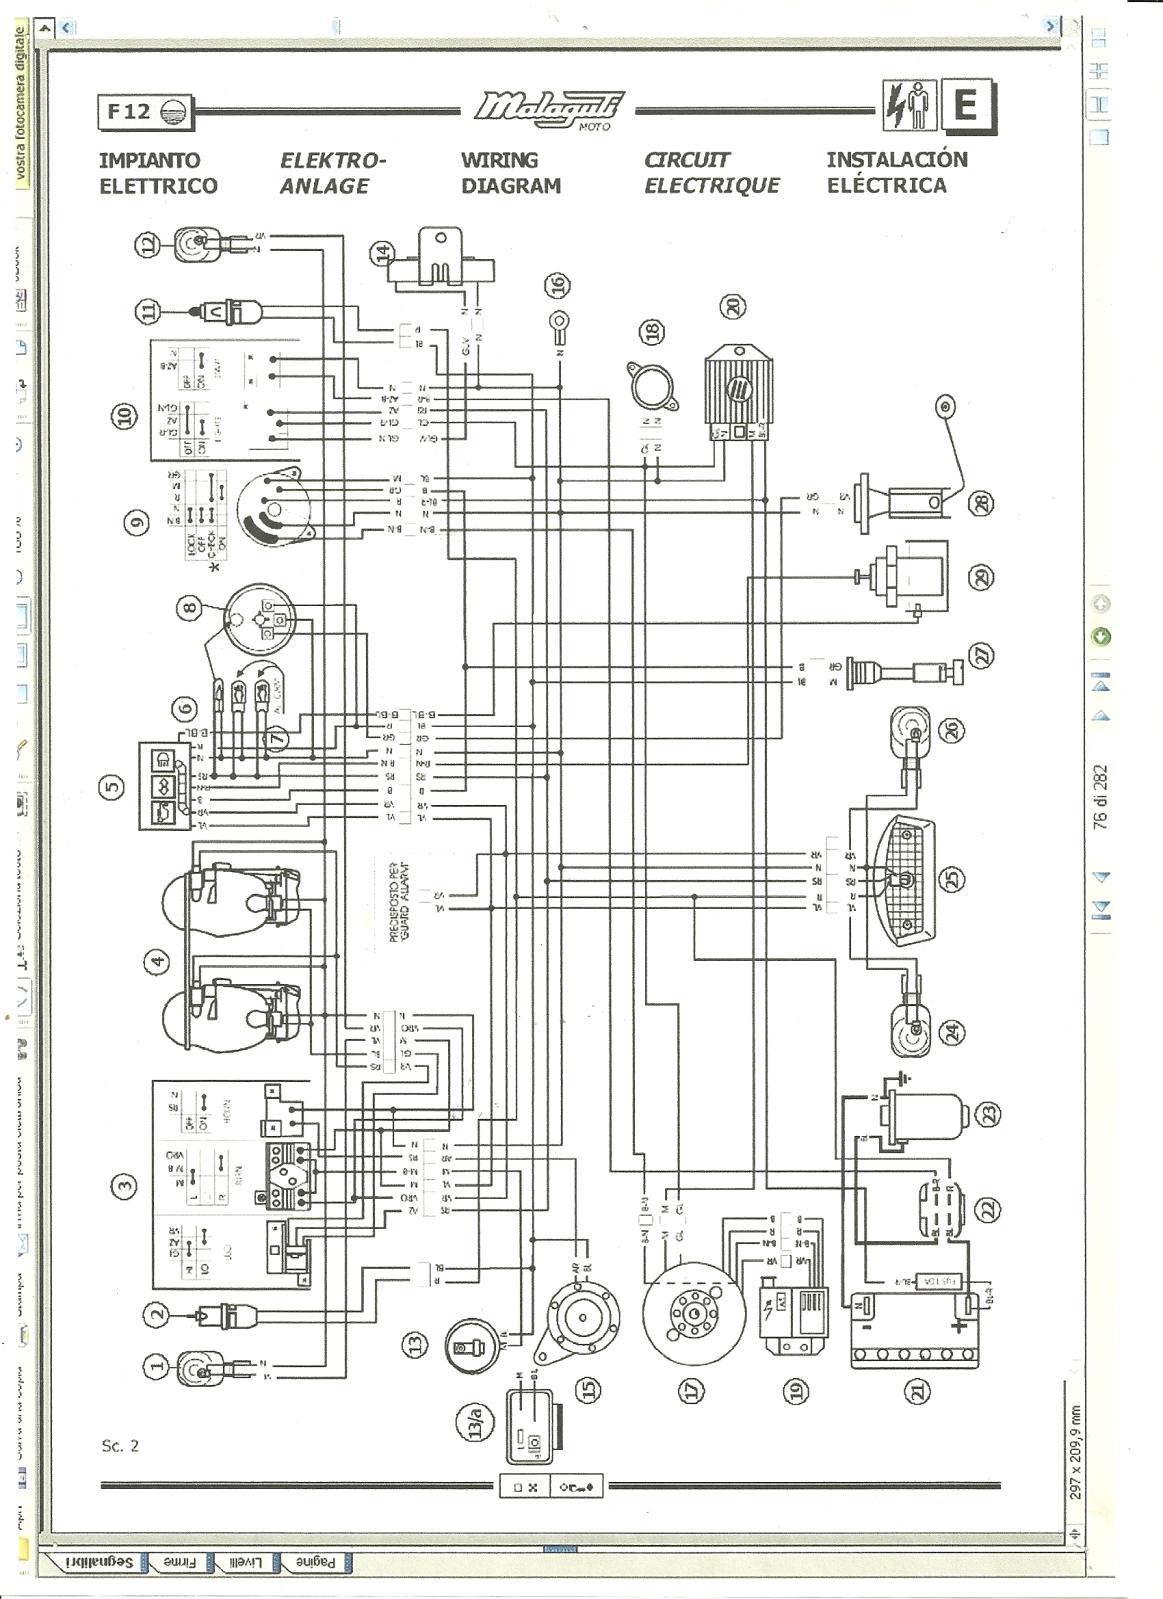 2004 yamaha r6 headlight wiring diagrams yamaha r6